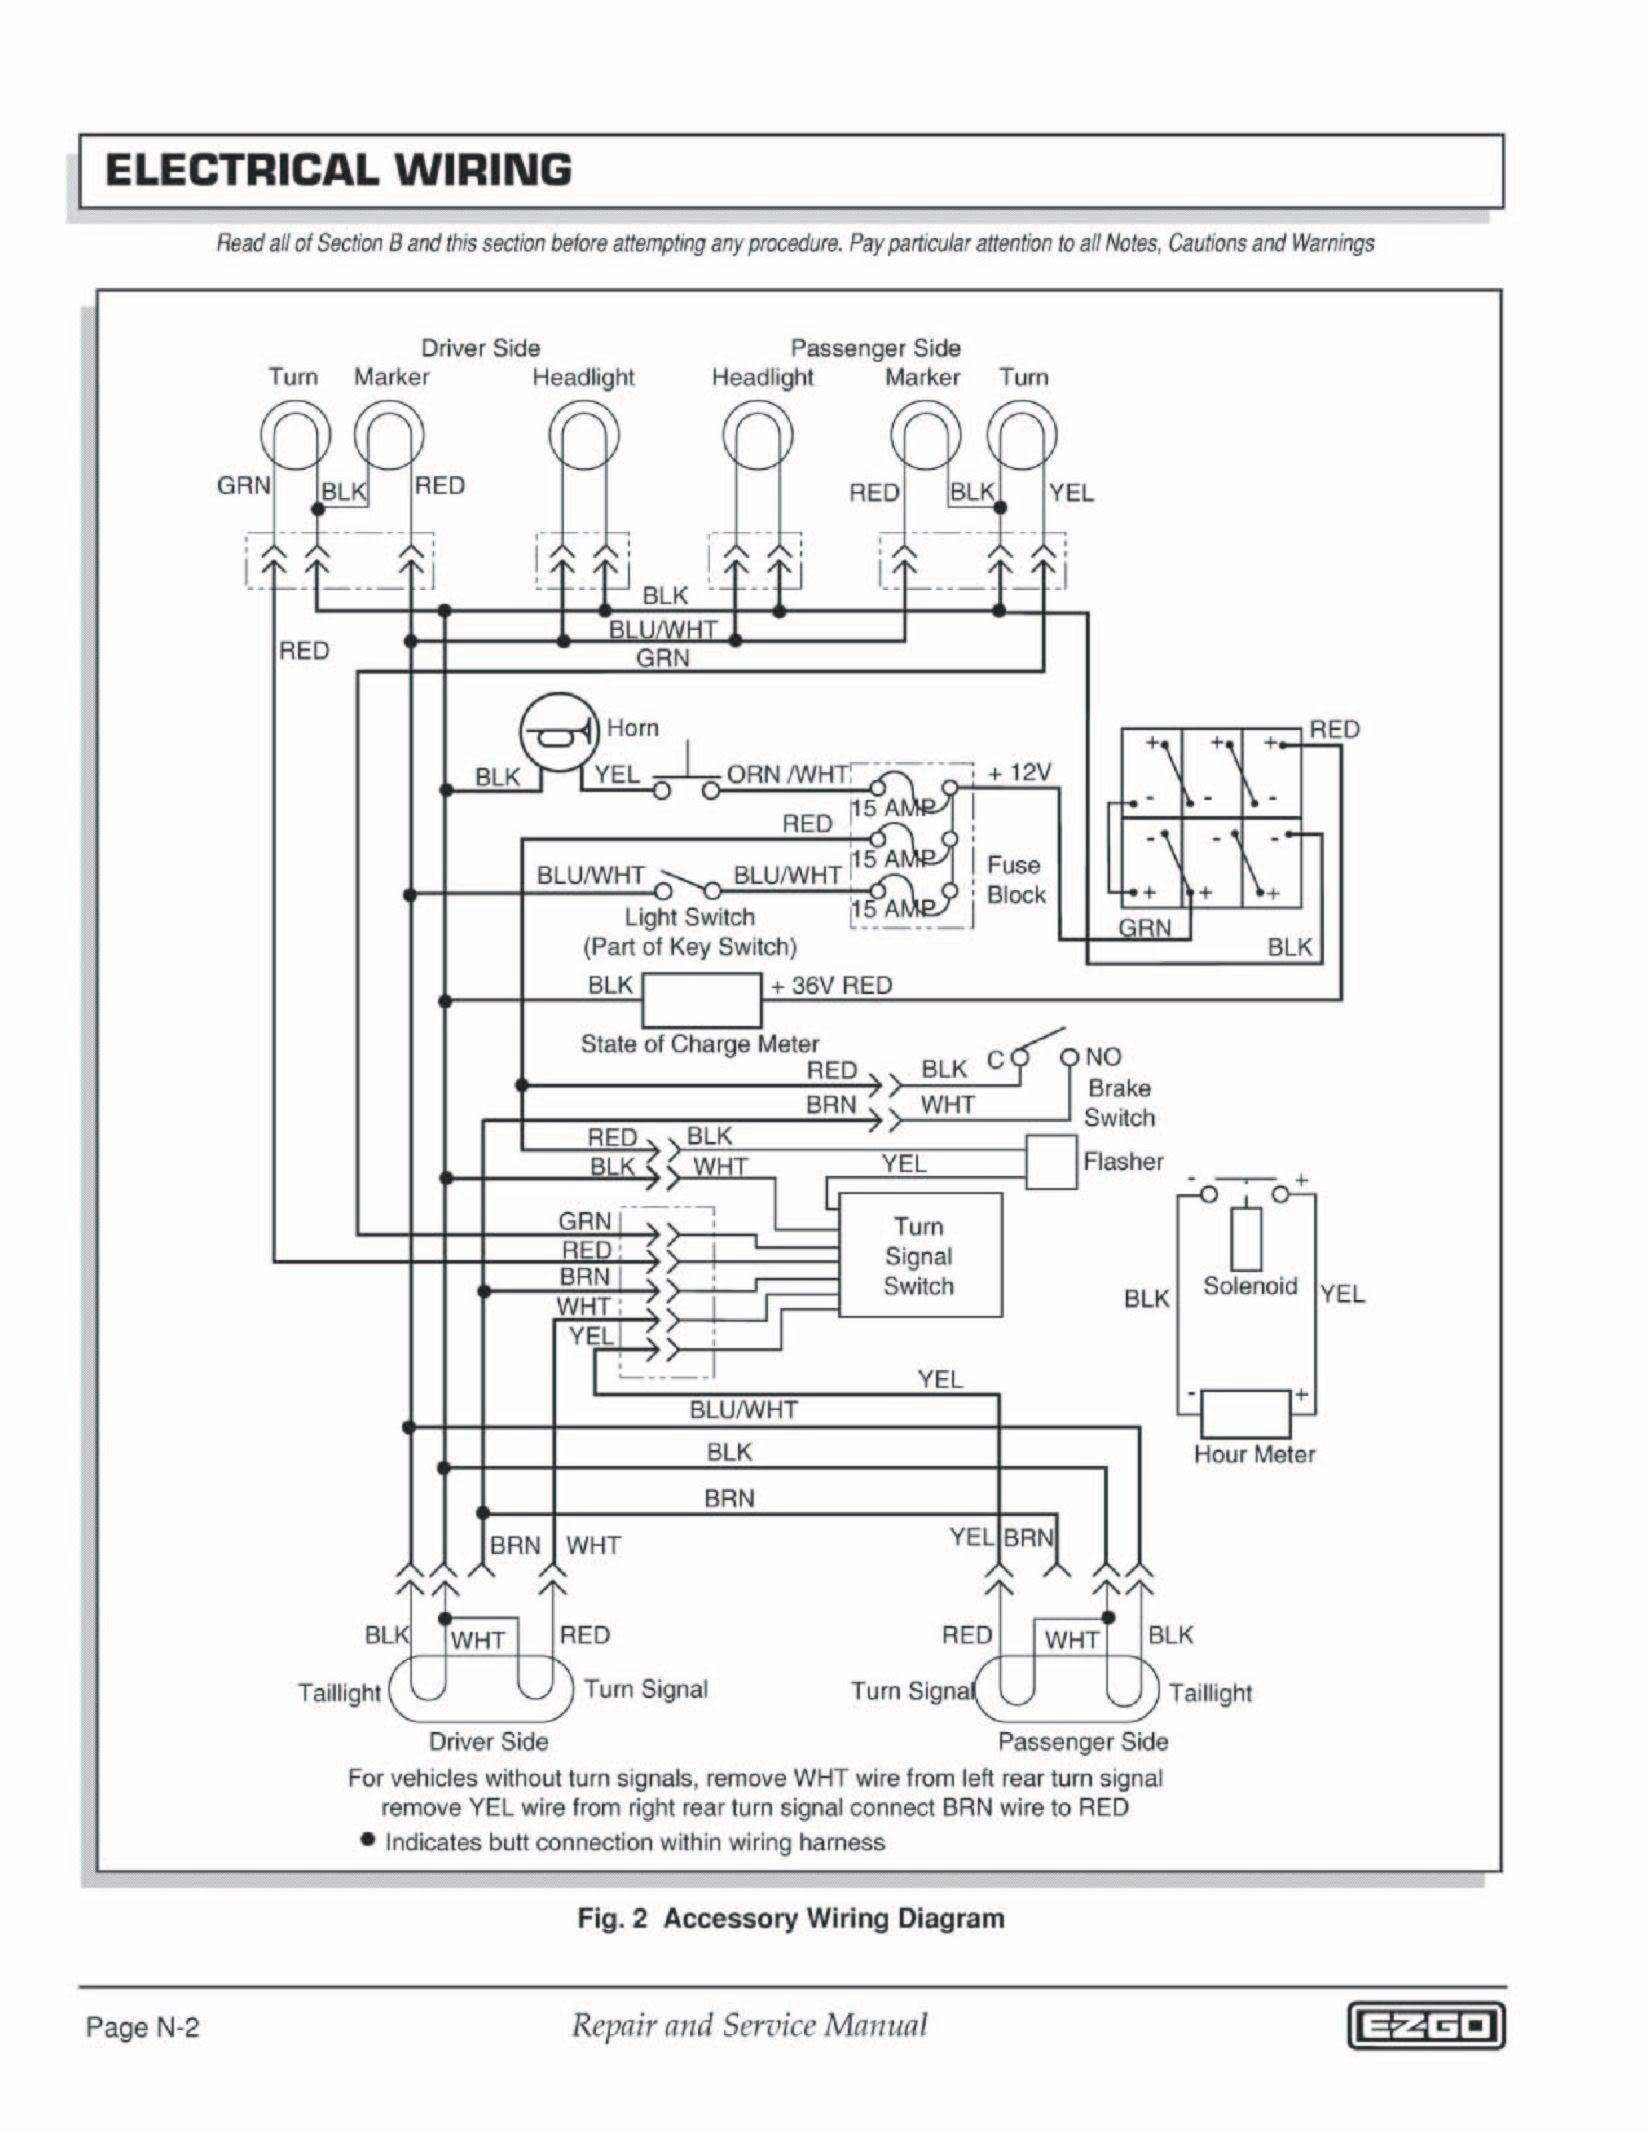 1988 Ezgo Gas Wiring Diagram - Worksheet And Wiring Diagram • - Ez Go Electric Golf Cart Wiring Diagram